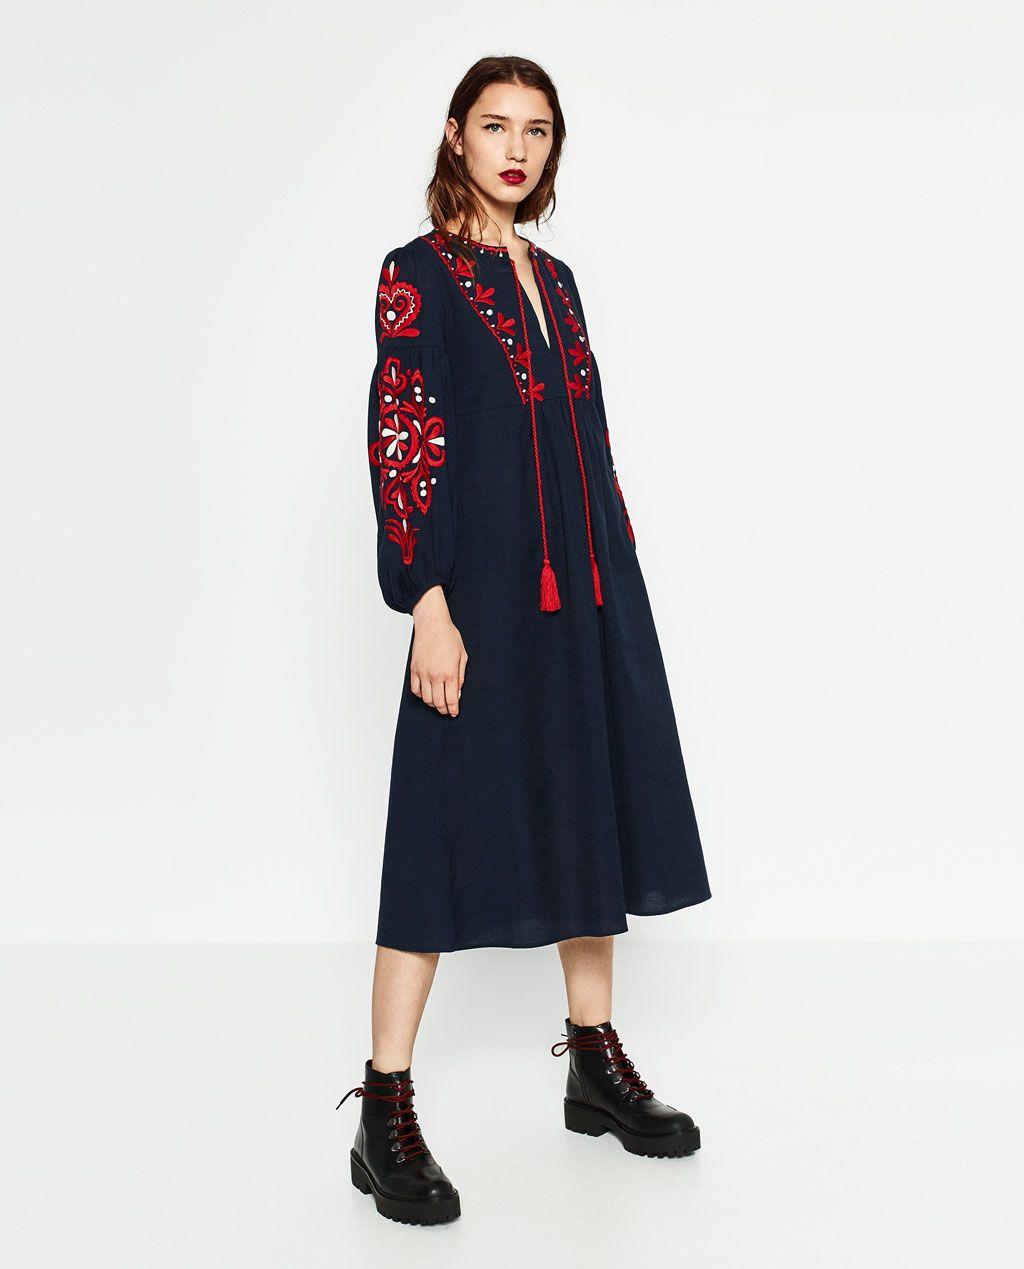 b97f4a98c46 Image 1 de ROBE LONGUE de Zara